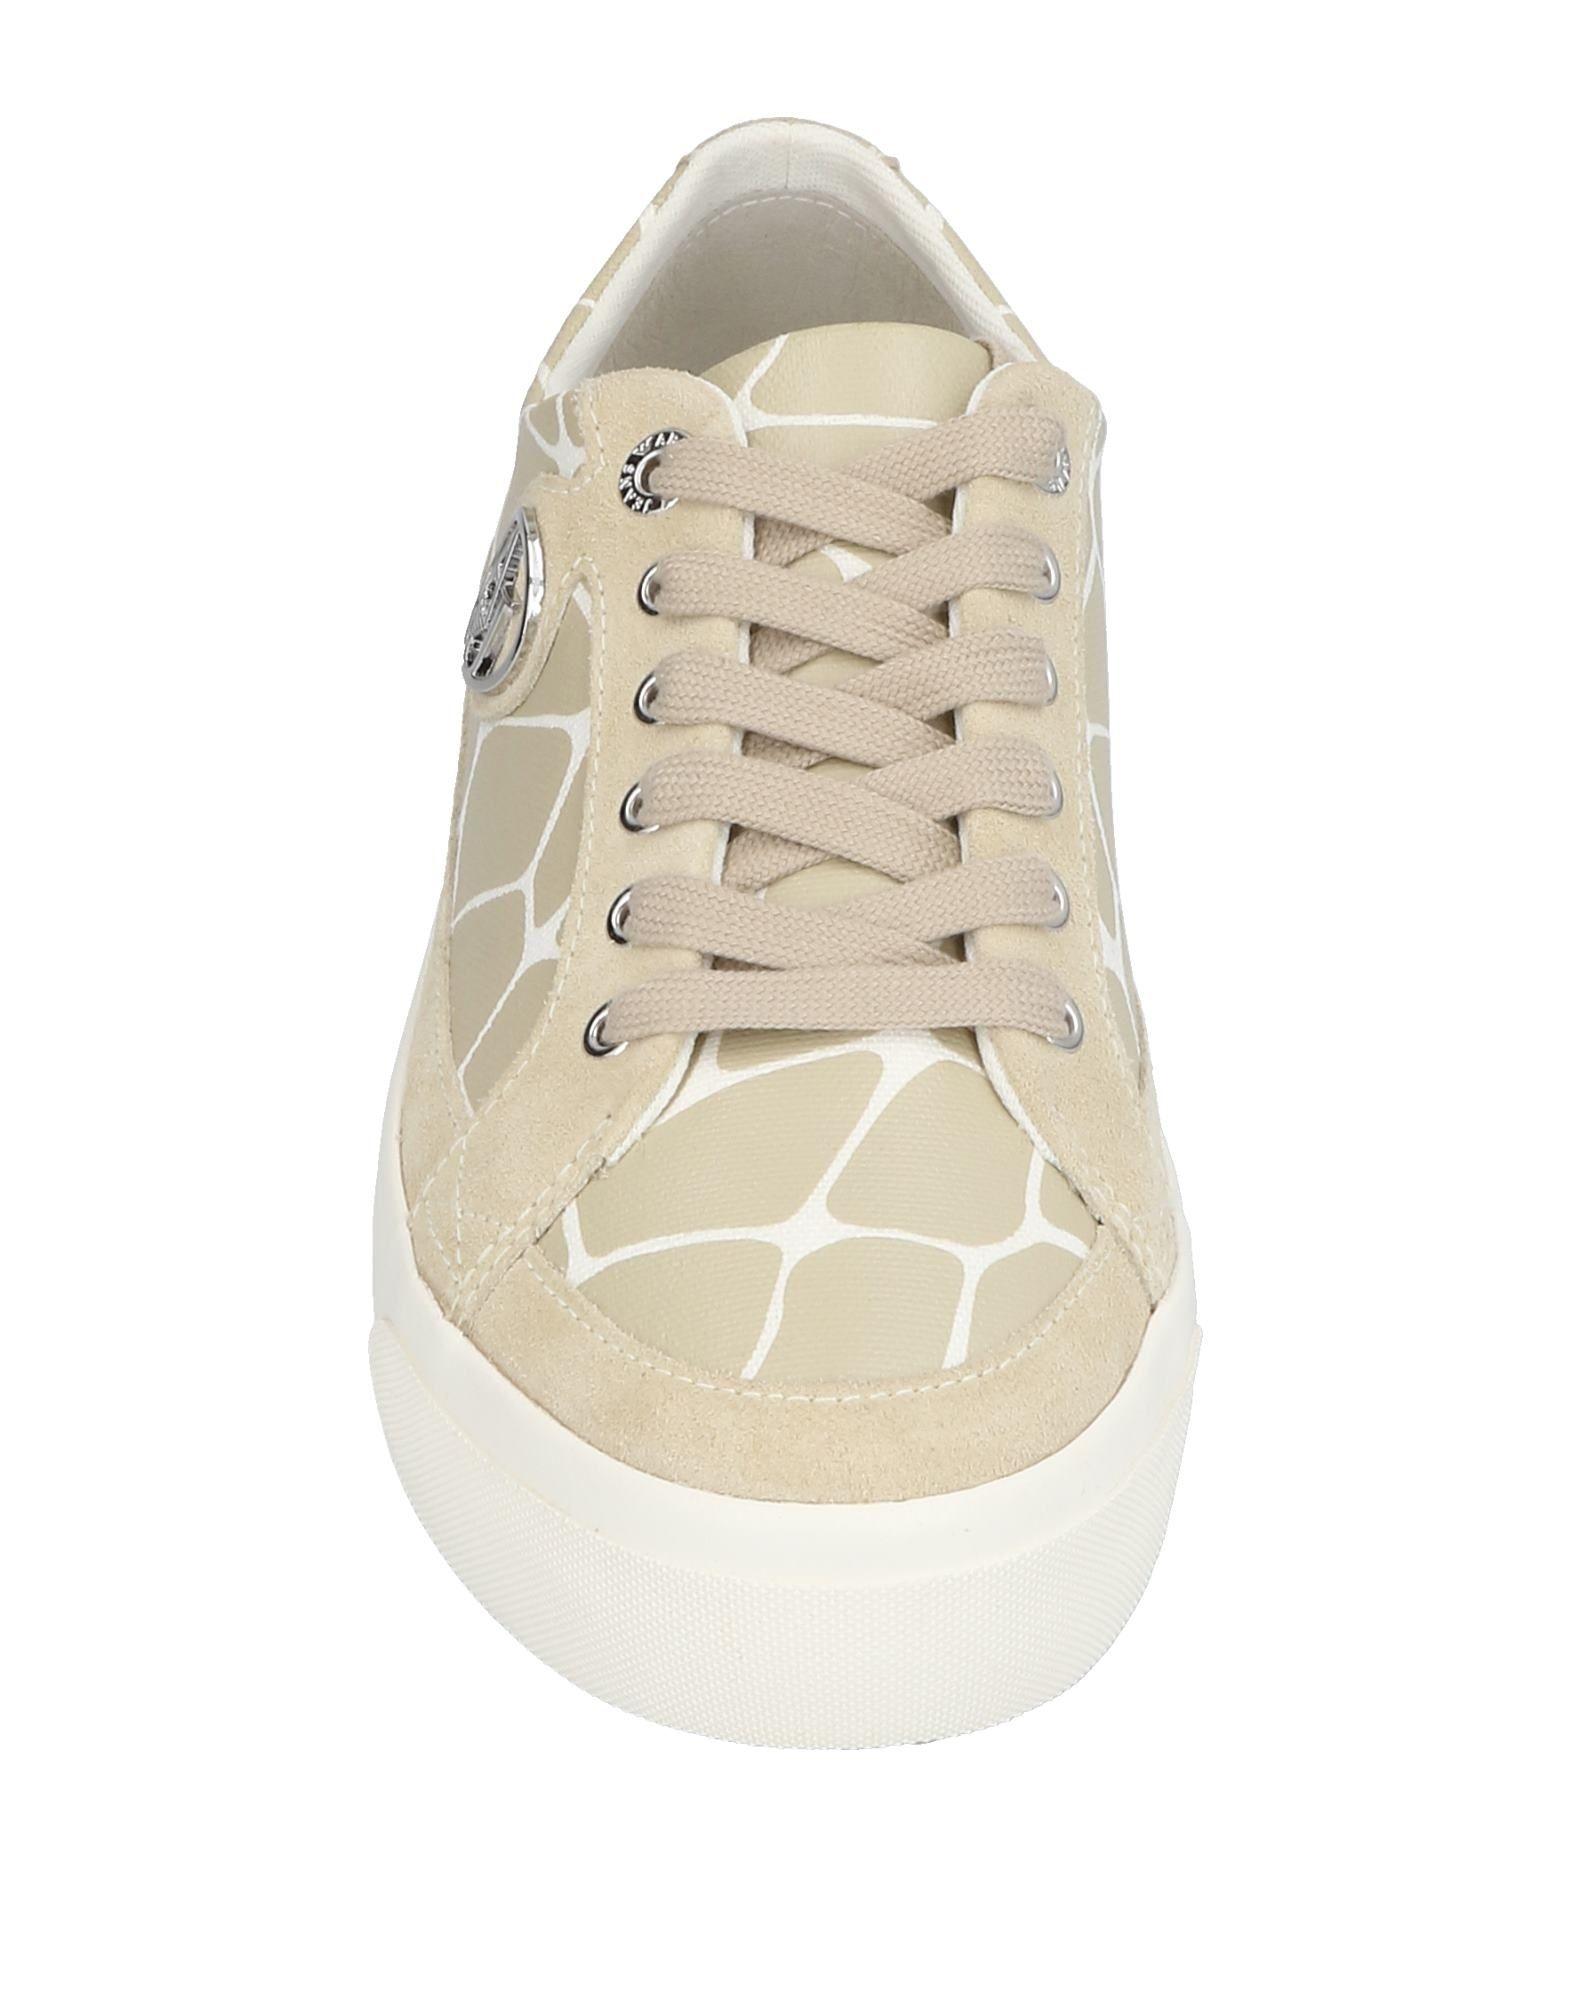 Sneakers Armani Jeans Femme - Sneakers Armani Jeans sur